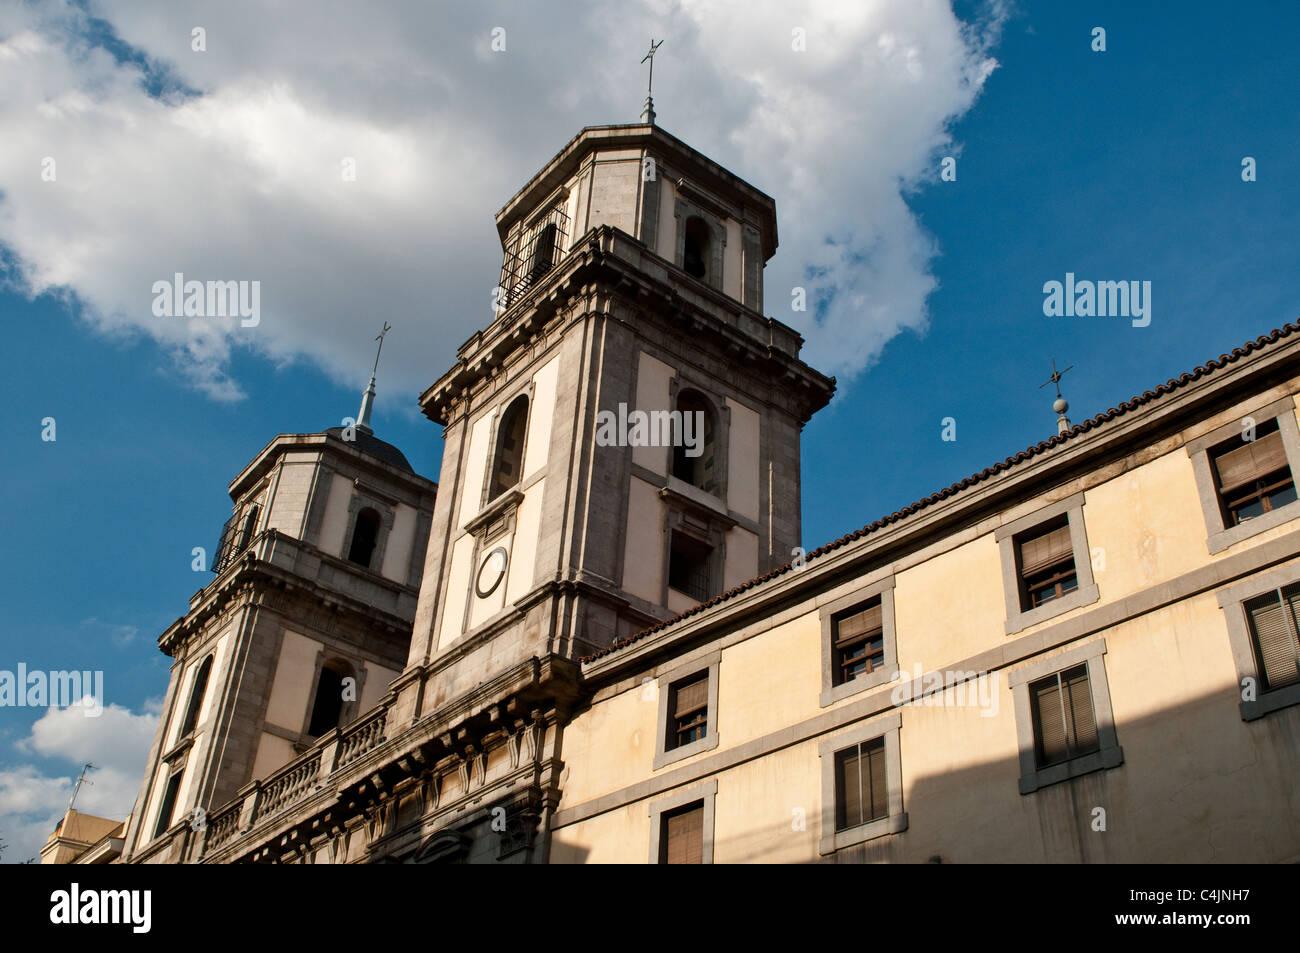 Colegiata de San Isidro, Madrid, Spain - Stock Image